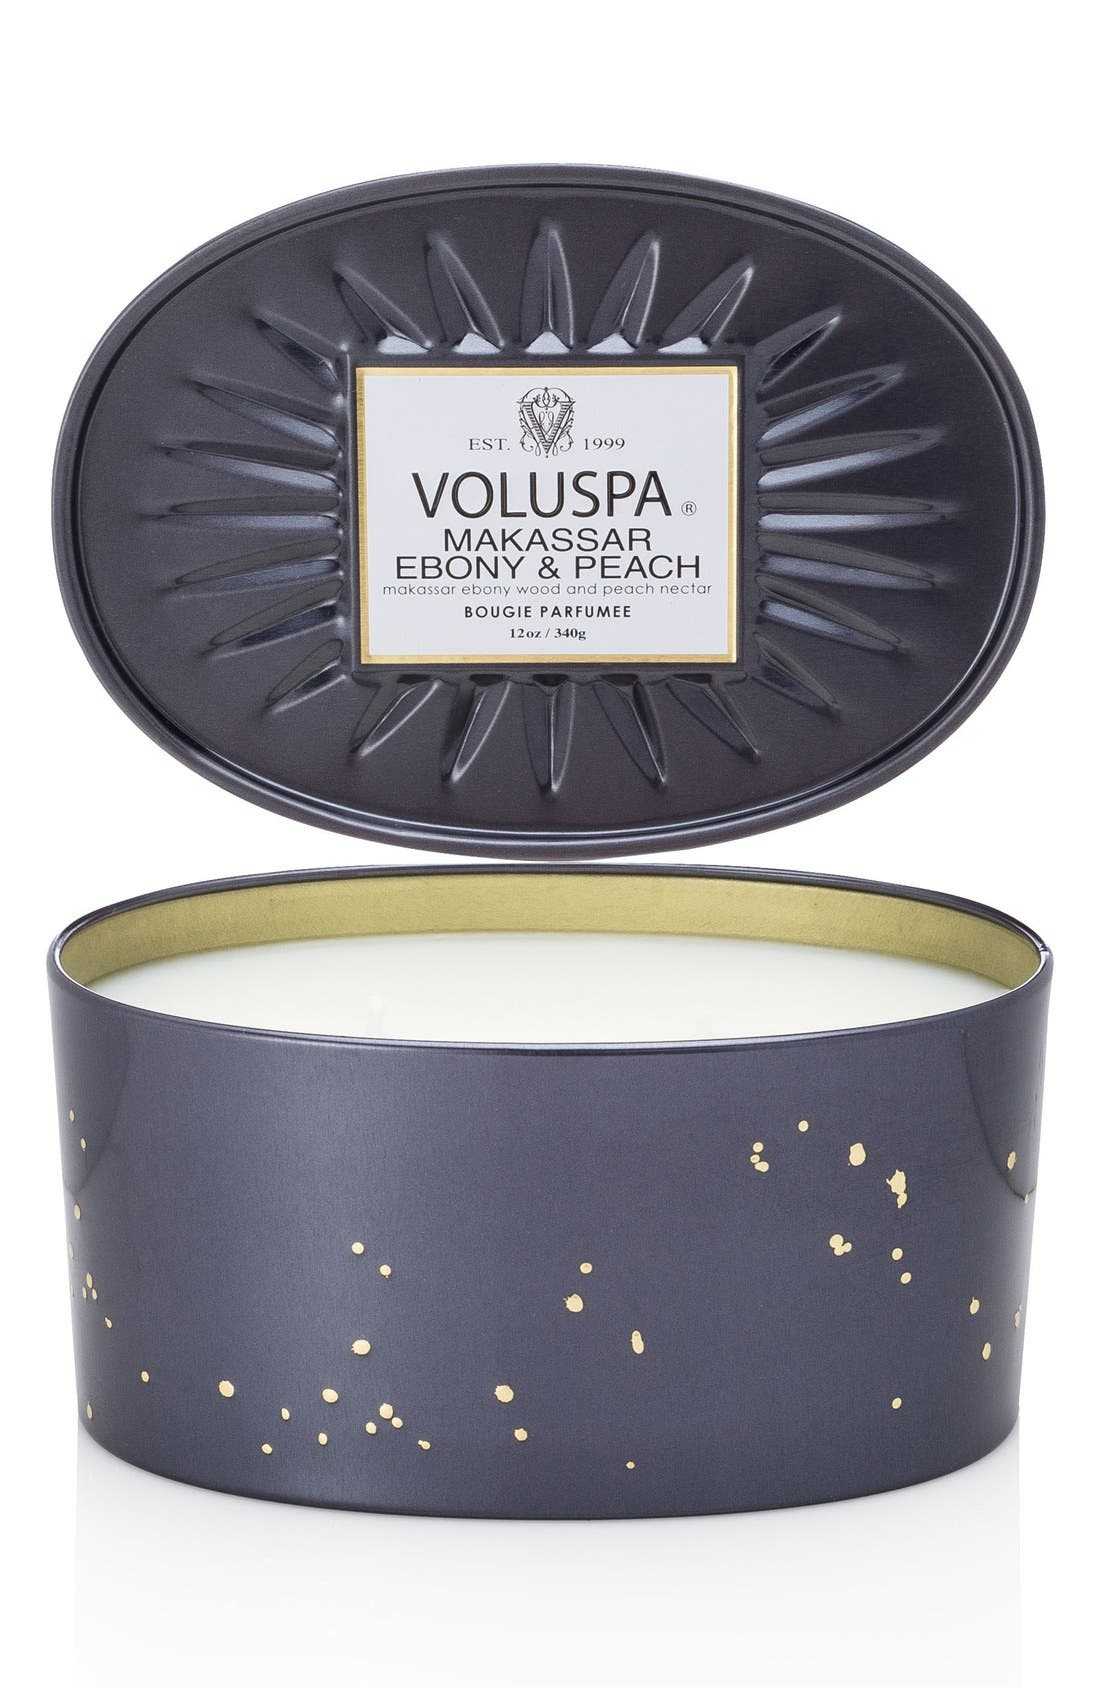 Voluspa 'Vermeil - Makassar Ebony & Peach' Two-Wick Candle